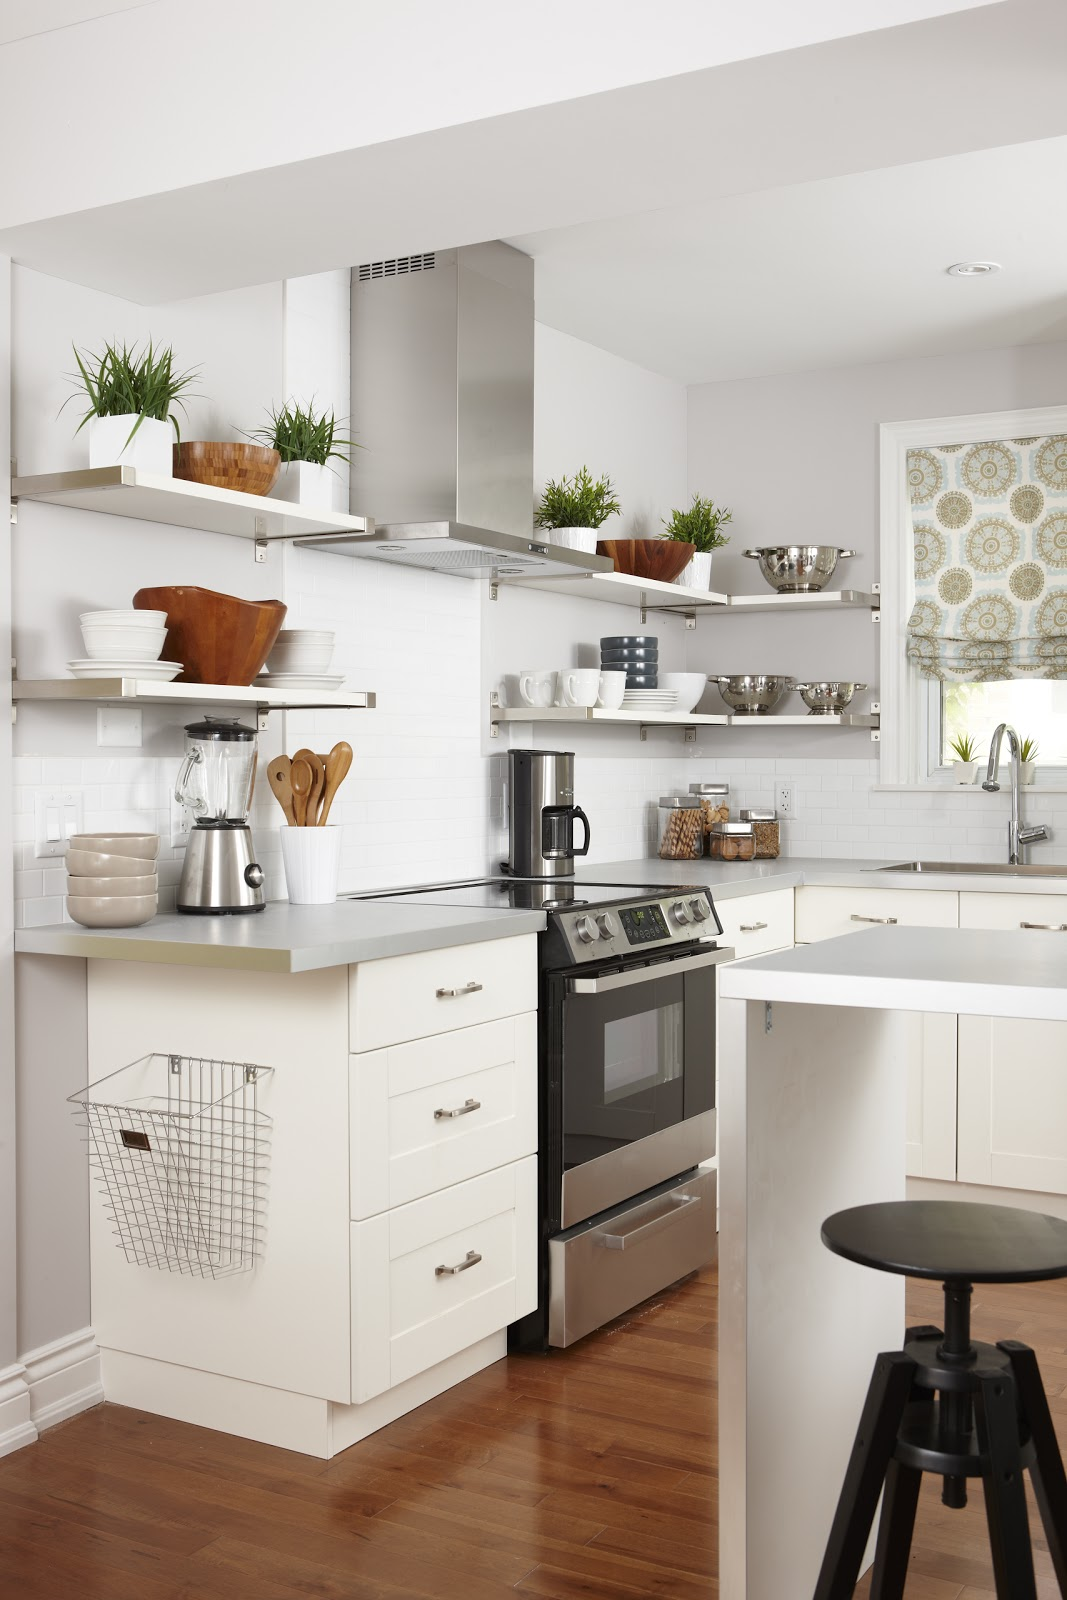 environmental designer home-furniture: On a Budget, IKEA ...